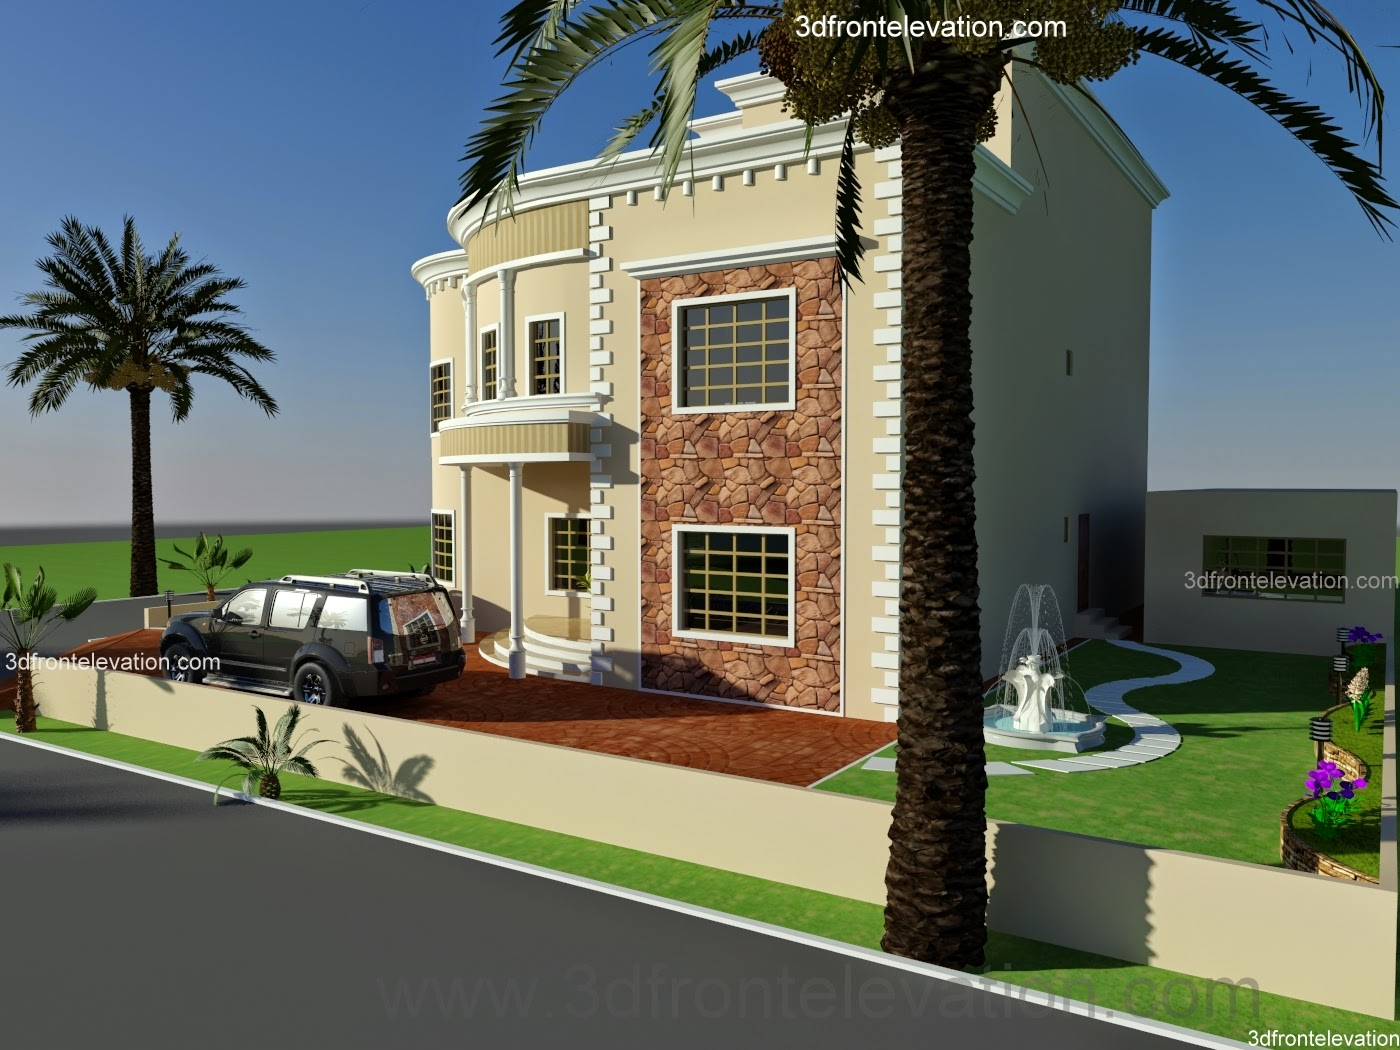 Front Elevation Of Duplex House | Joy Studio Design Gallery - Best ...